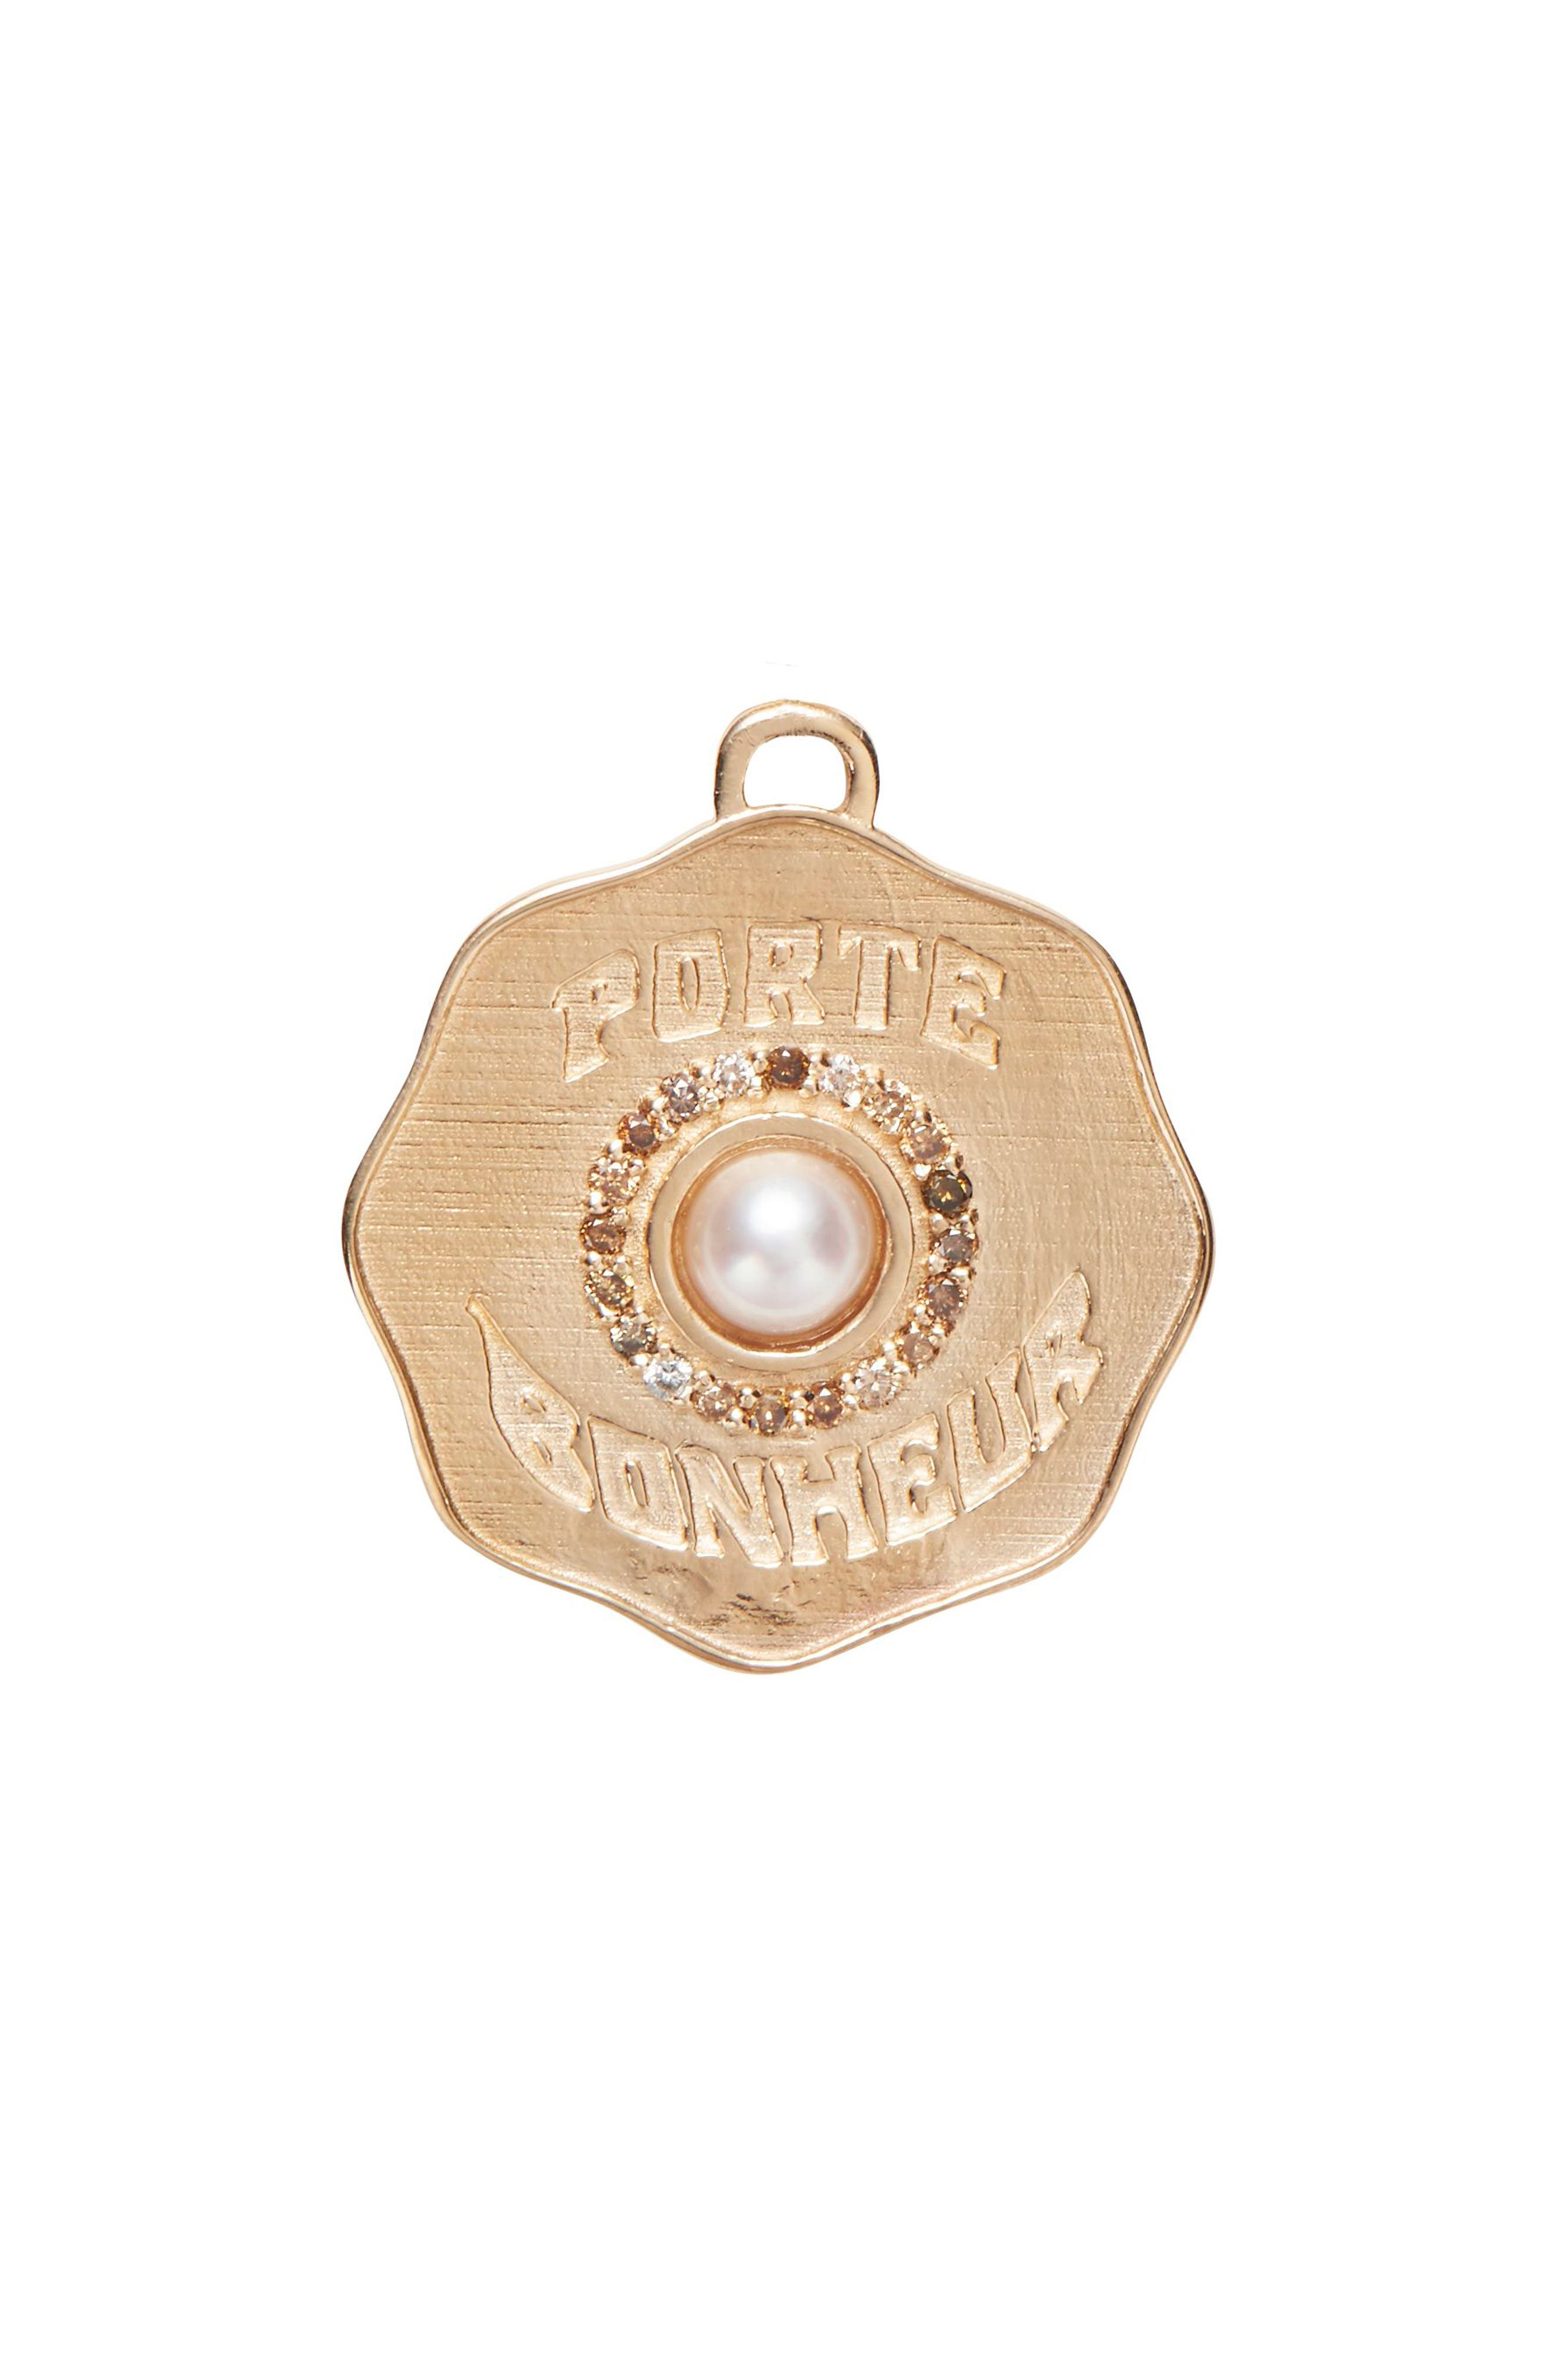 MARLO LAZ Porte Bonheur Pearl Coin Charm in Yellow Gold